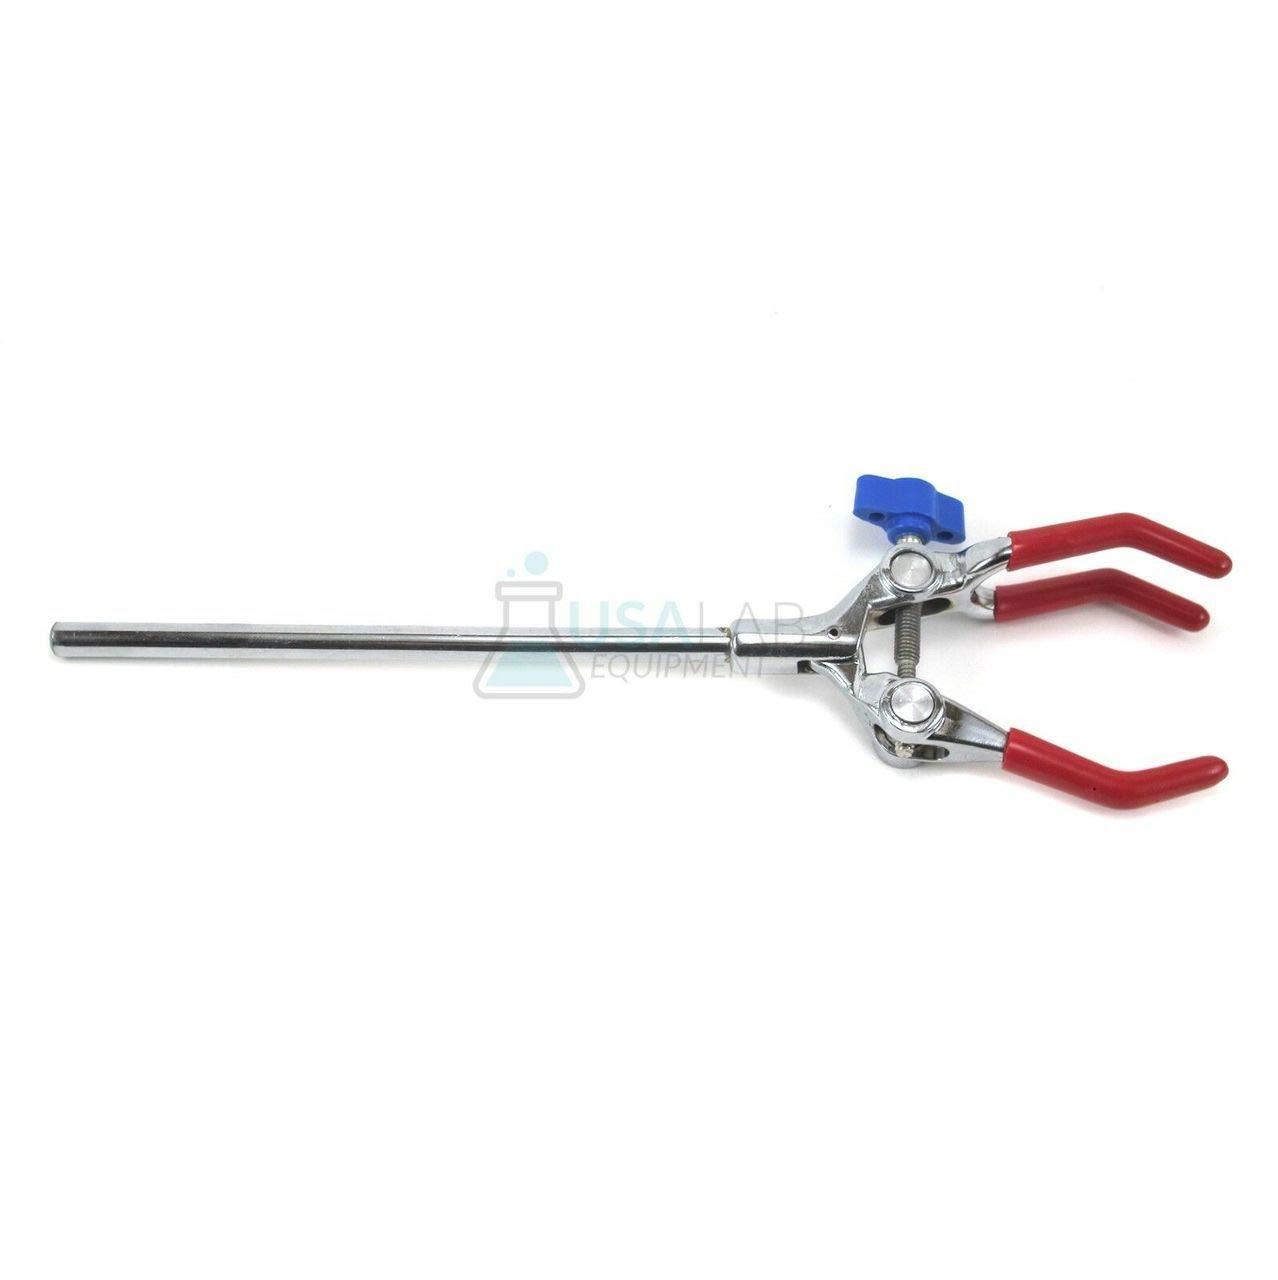 10-90mm 3 Prong Single Adjust Jaw Lab Clamp